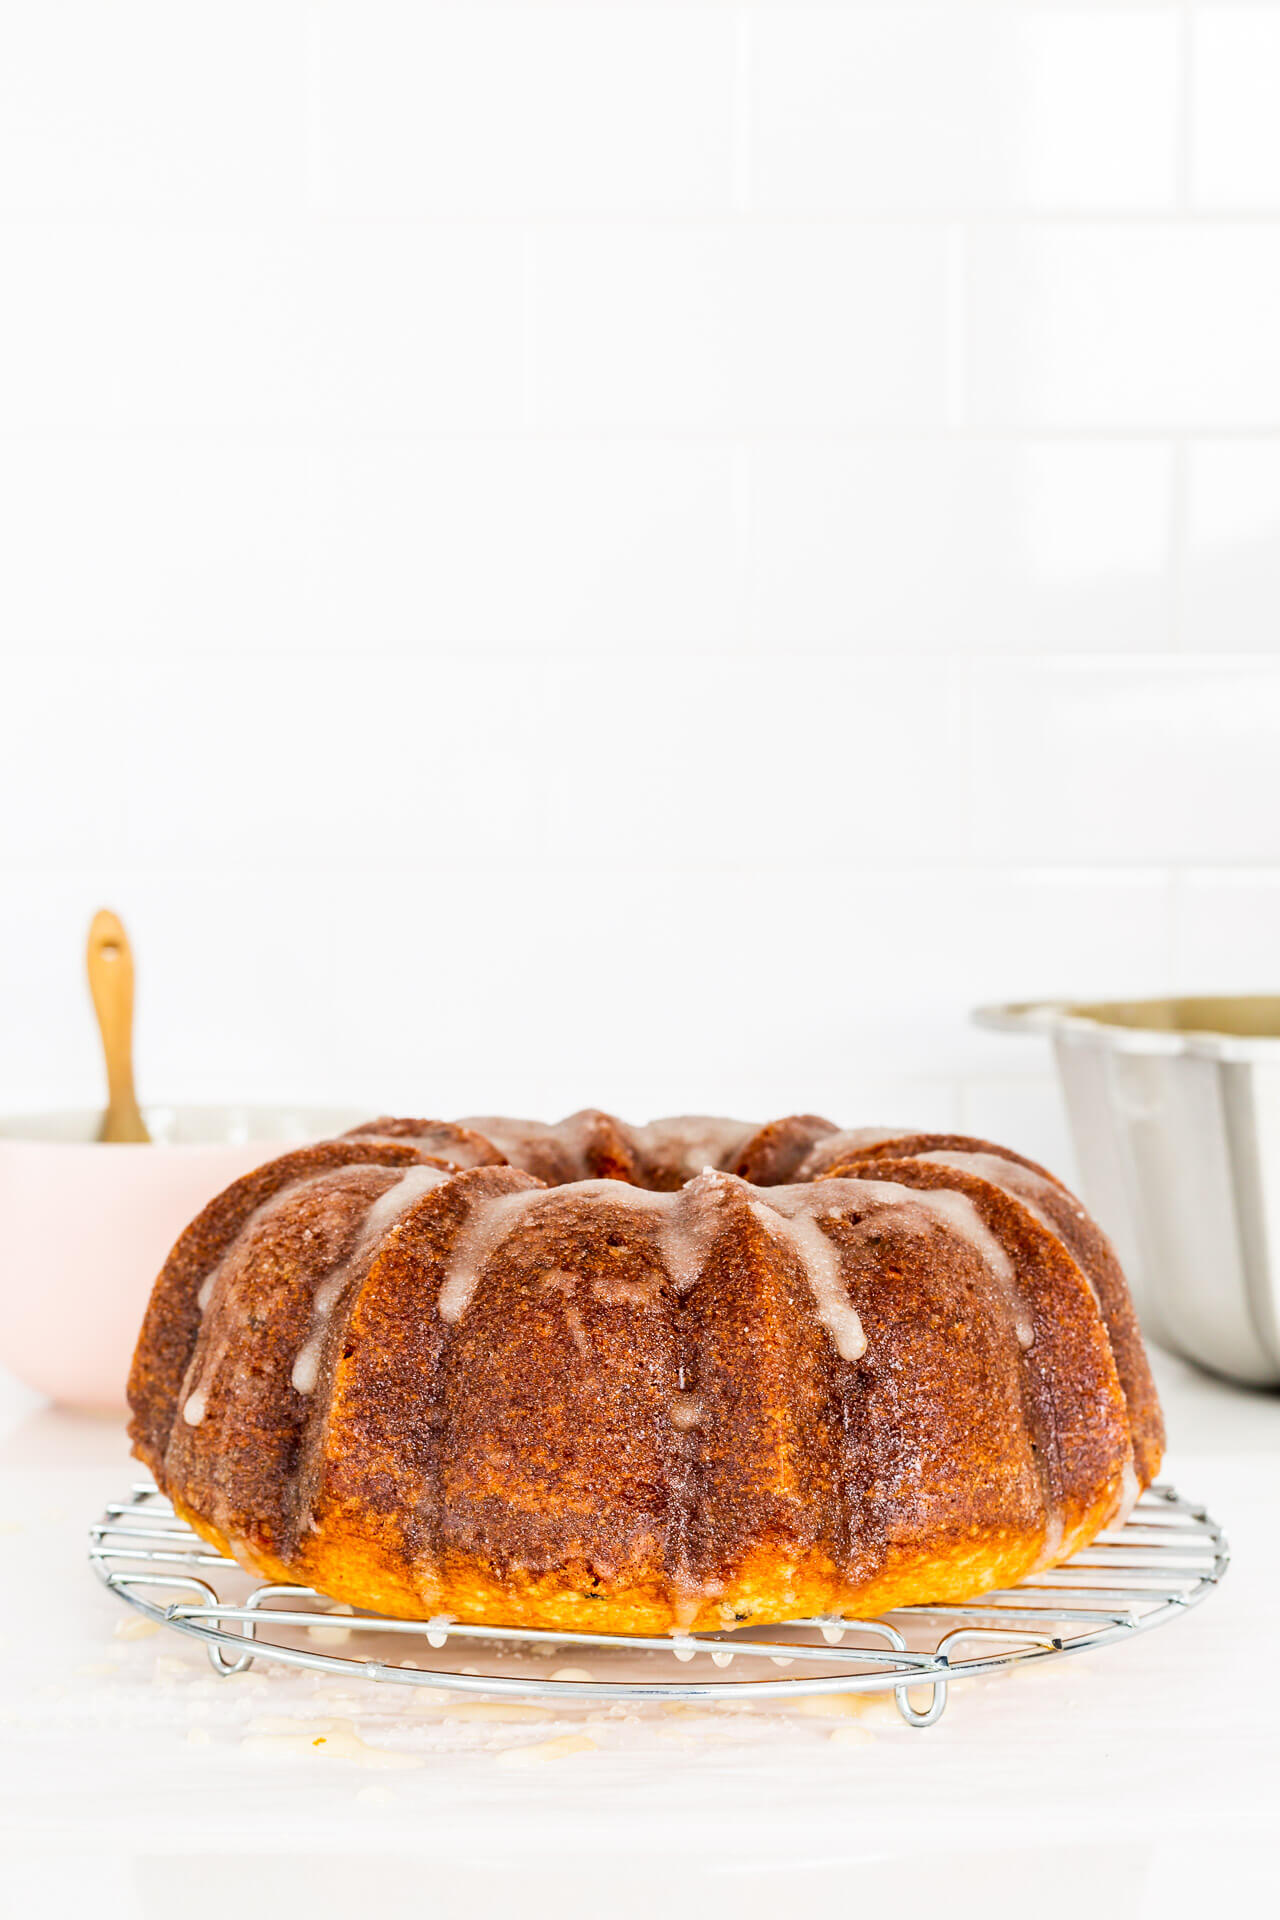 Glazing a bundt cake, set on a wire rack, painting on a sugar glaze using a pastry brush/